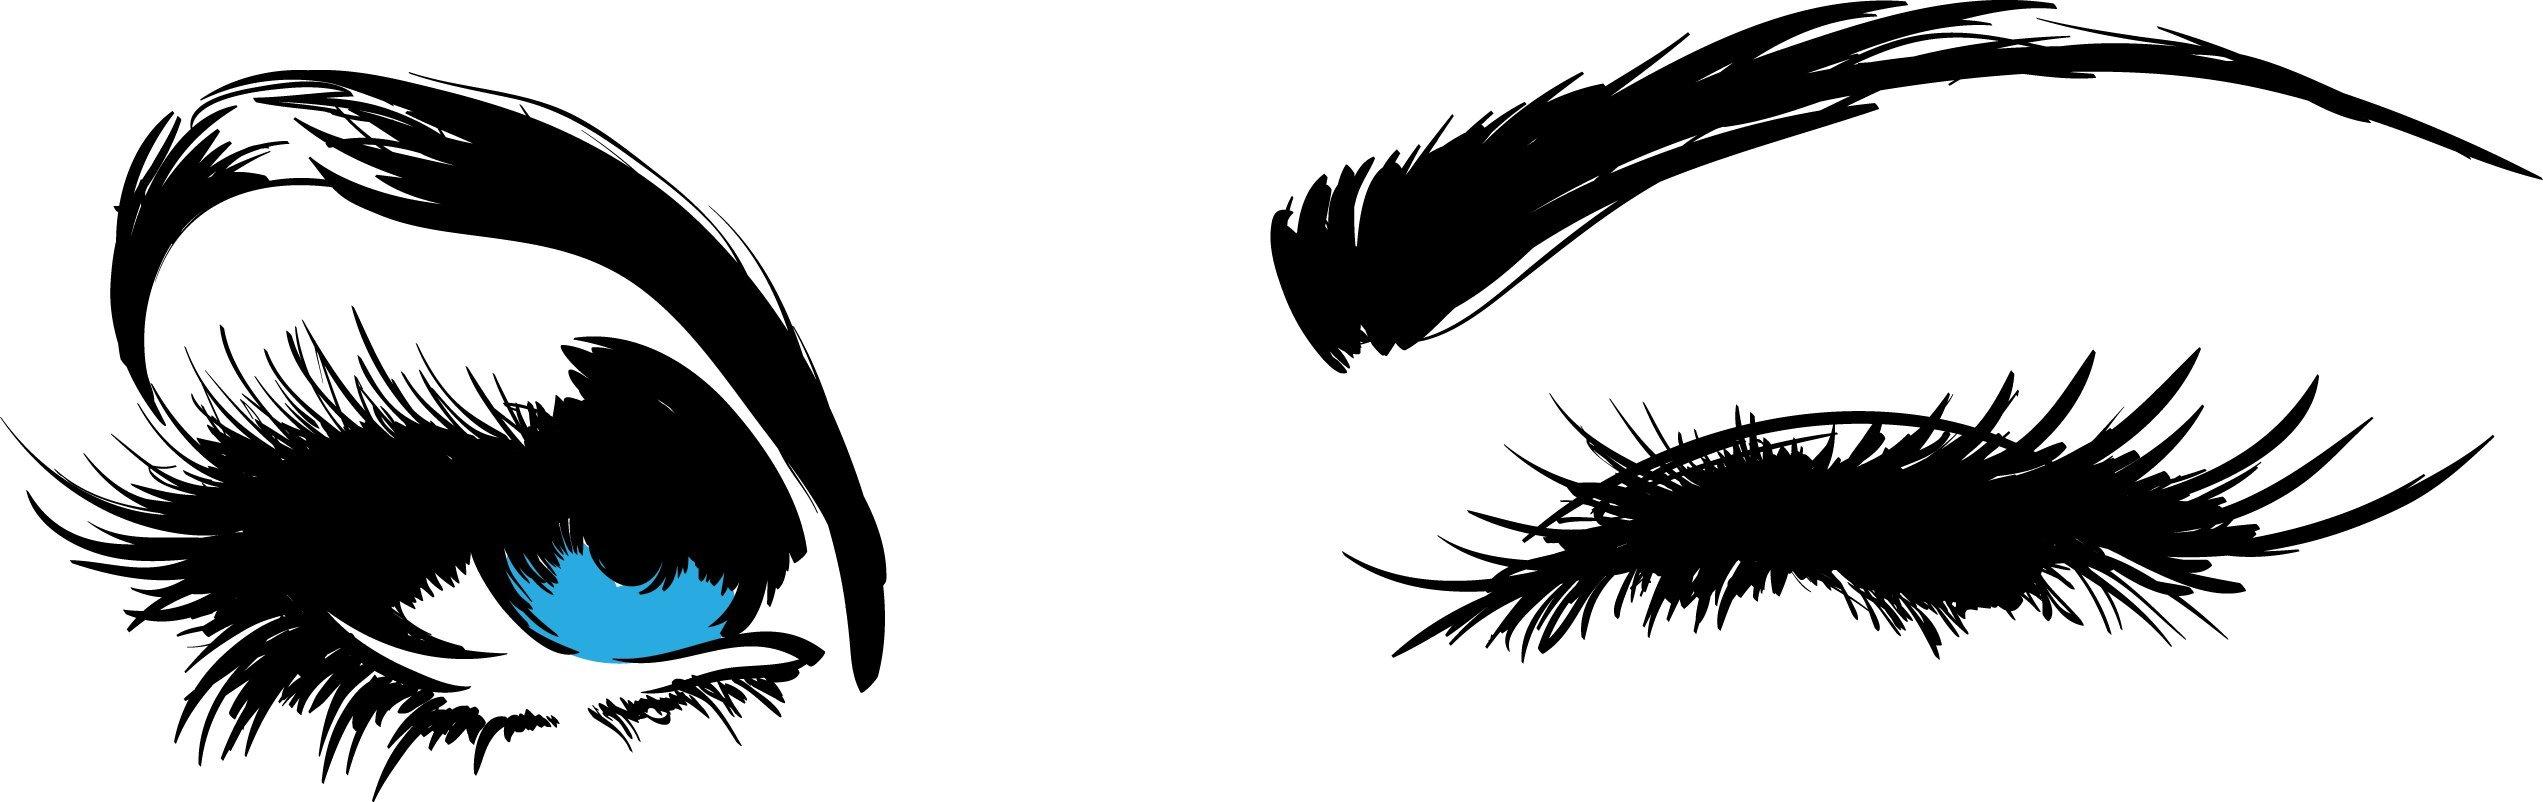 "ChicWalls Removable Custom Eyes Eye Brow Silhouette Wall Art Decor Decal Vinyl Sticker Mural Salon Bedroom Living Room 40"" X 13"" Ice Blue"